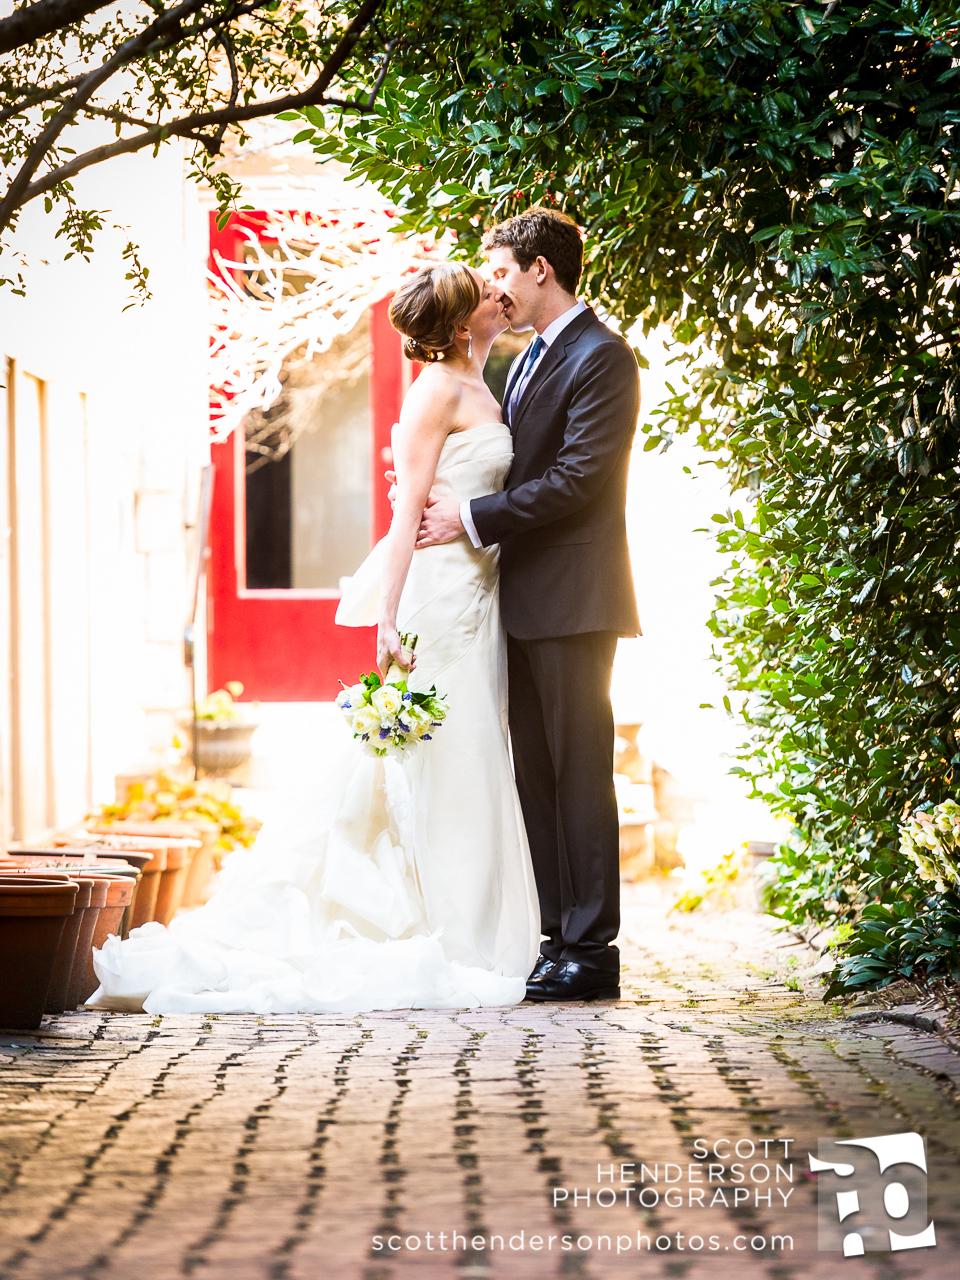 yearinreview-wedding-004.jpg